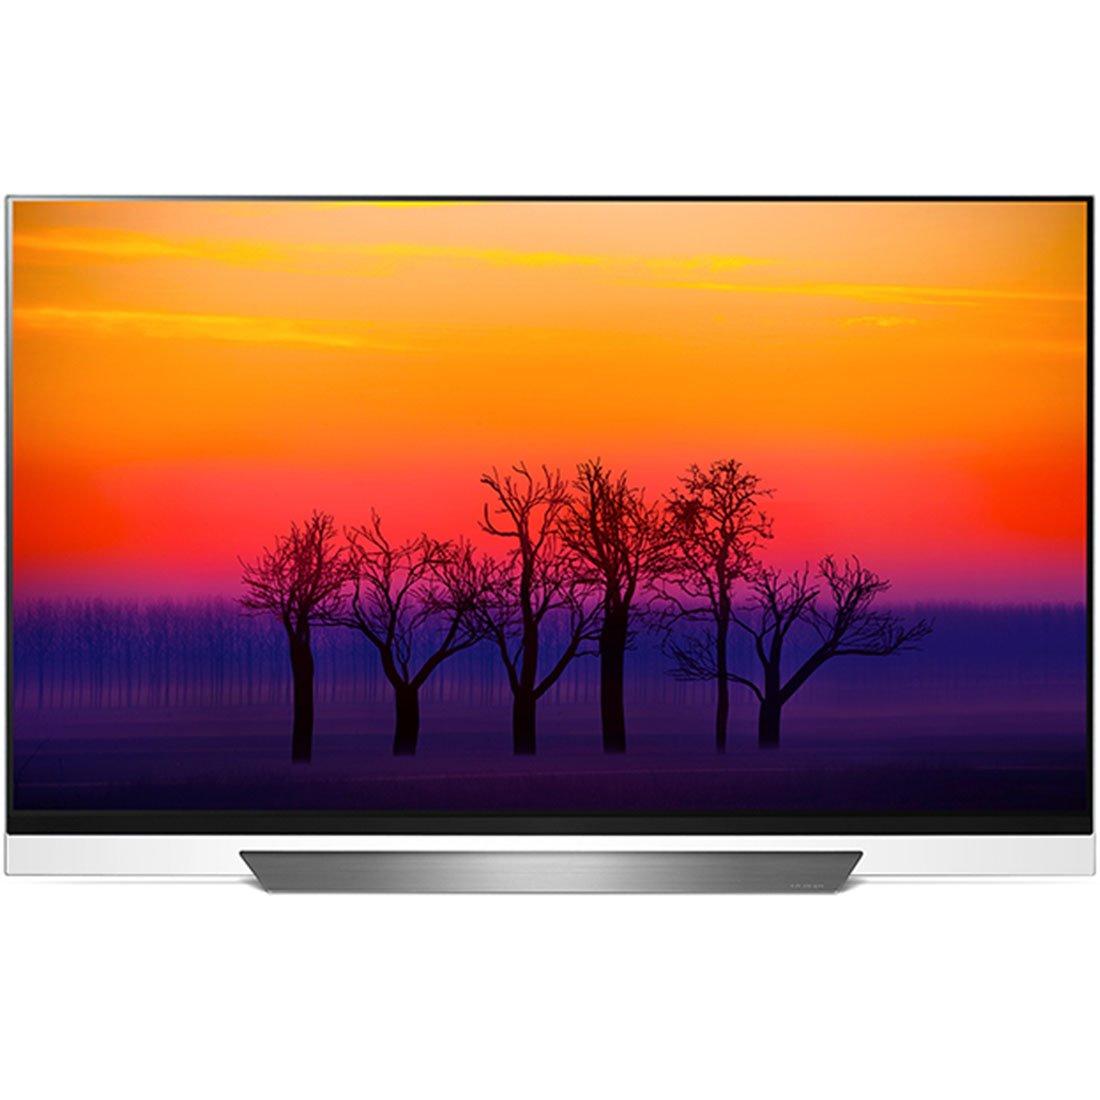 lg oled55e8 4k hdr smart ai oled tv w thinq. Black Bedroom Furniture Sets. Home Design Ideas